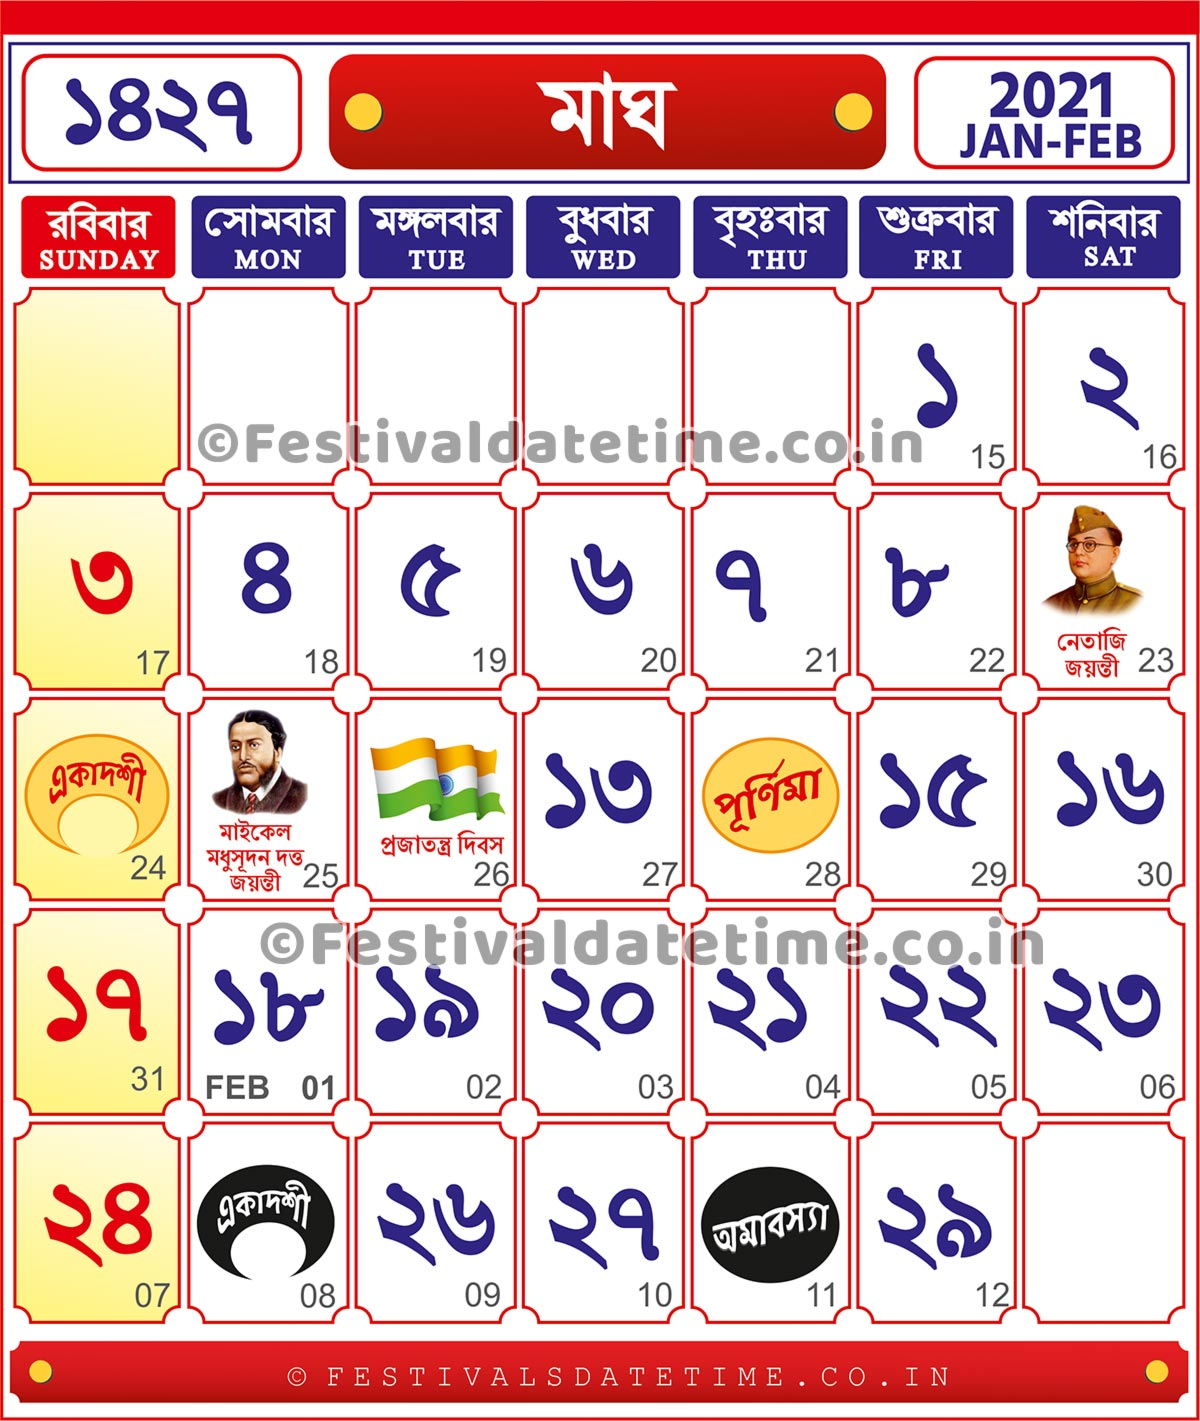 1427 Bengali Calendar - 1427 Maagh Month Calendar - 1427 Maagh Bangla Calendar